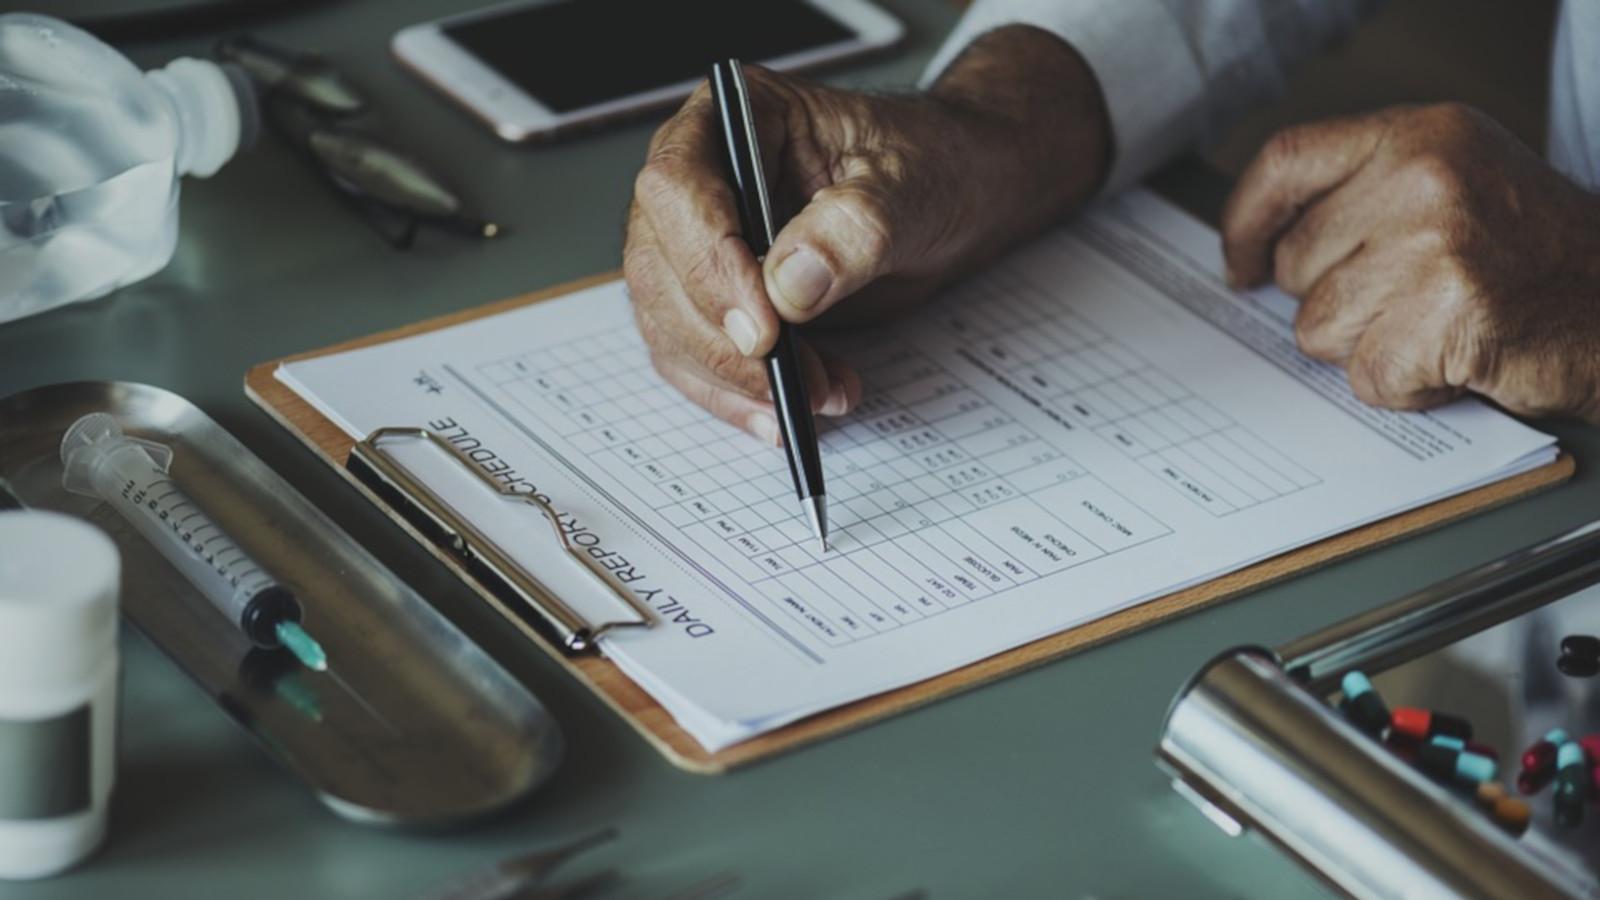 Funding, regulations top the challenges Africa's healthcare startups face [Sponsored] - Ventureburn